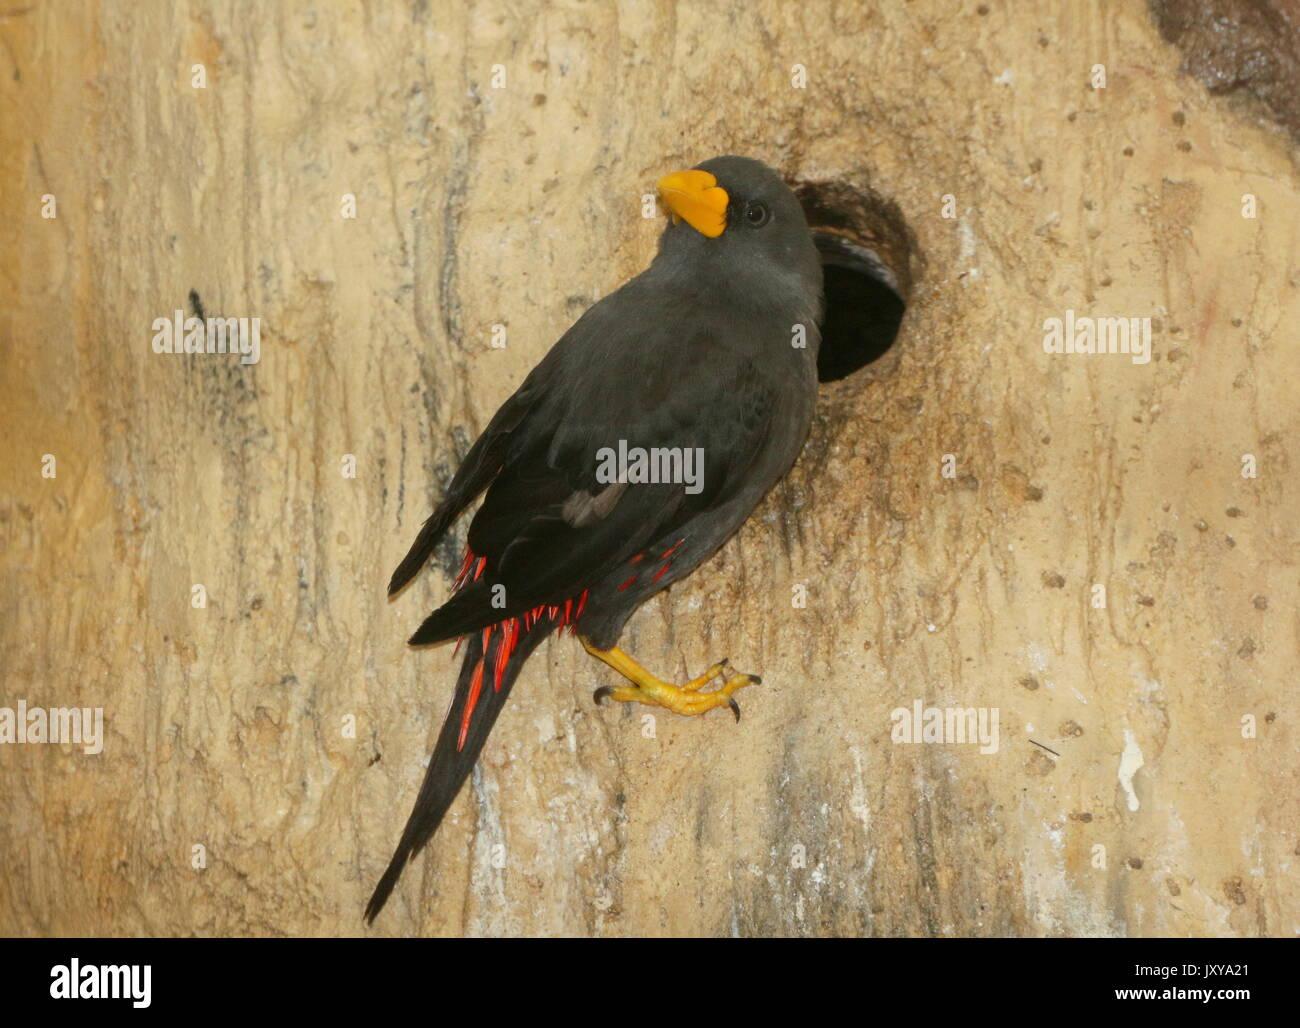 Nesting Sulawesi  Grosbeak starling or grosbeak myna (Scissirostrum dubium). A.k.a. Celebes finch billed or scissor billed starling. - Stock Image